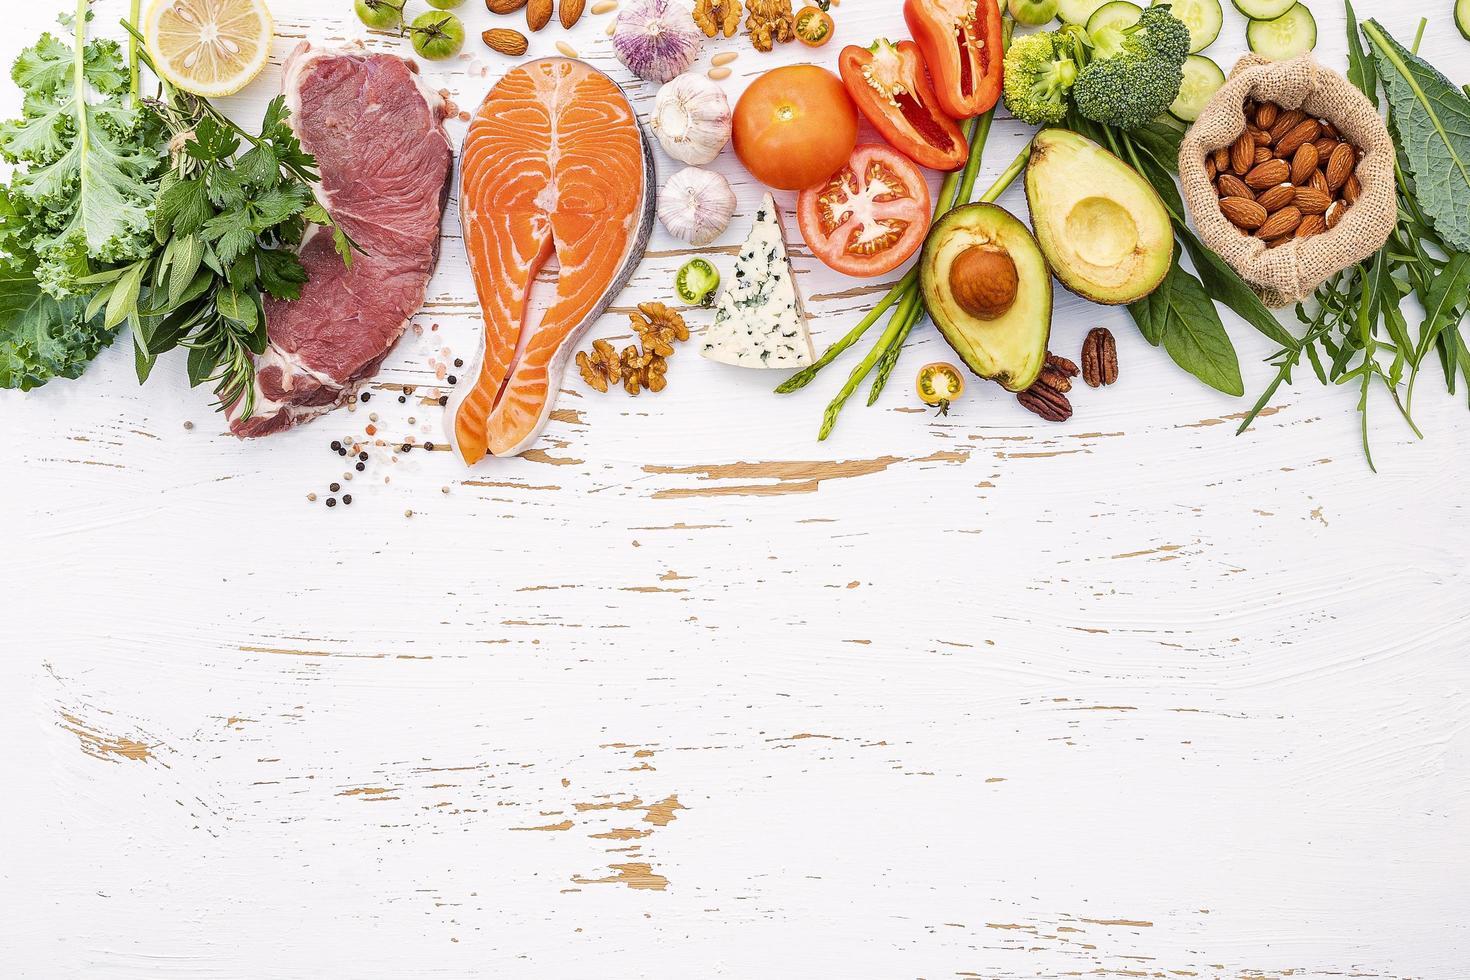 Organic ingredients on shabby white background photo